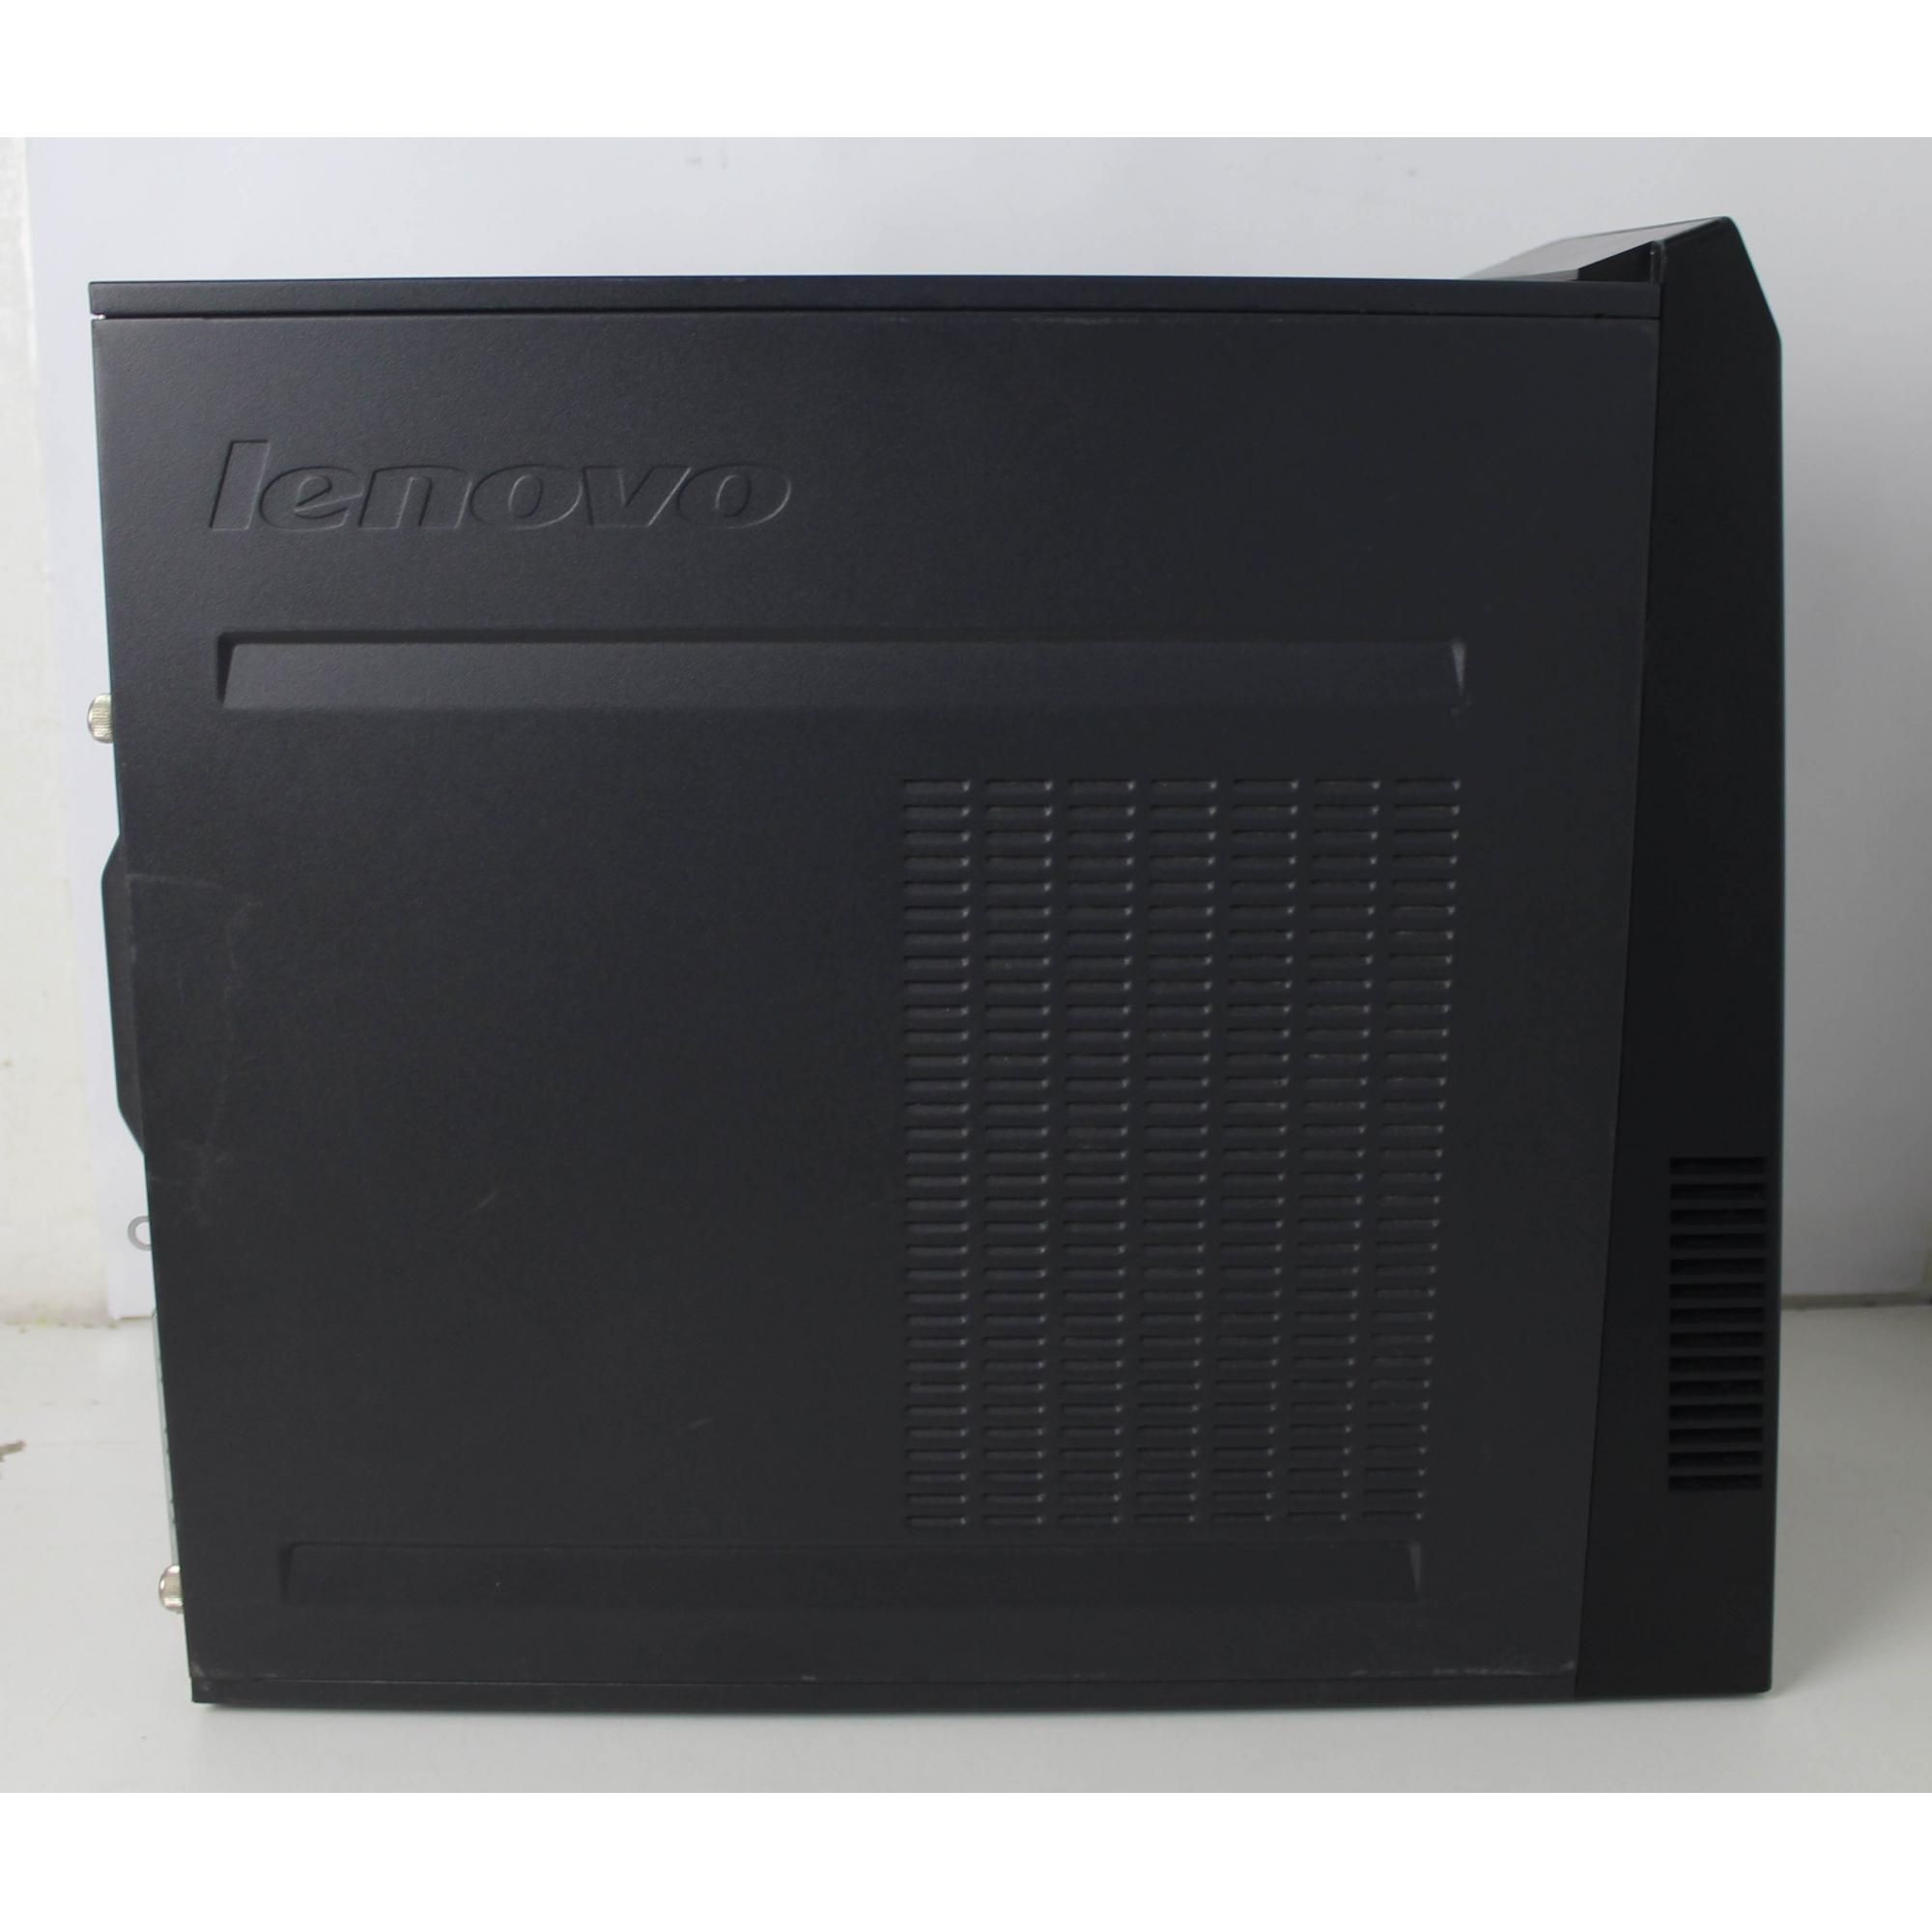 CPU LENOVO 63 INTEL CORE I3 3.4GHZ 4GB HD-500GB